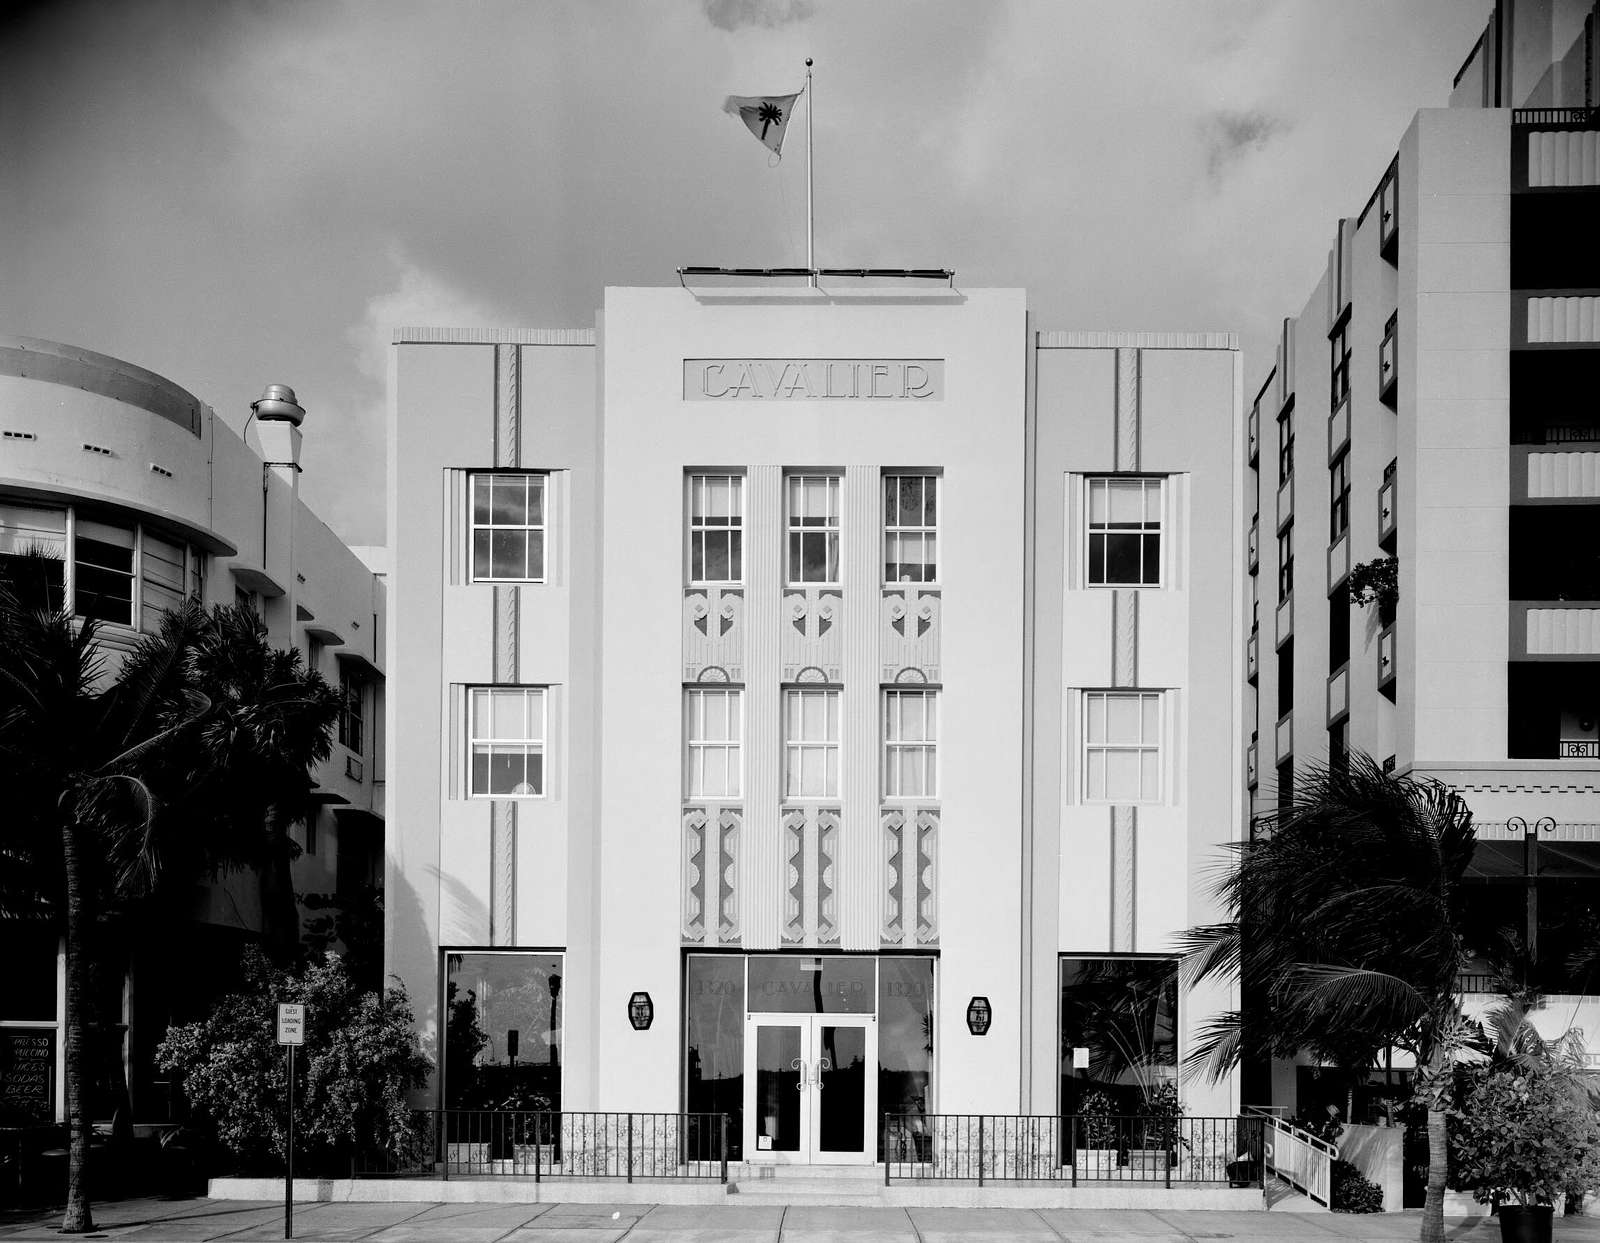 Art deco building in South Beach neighborhood of Miami Beach, Florida